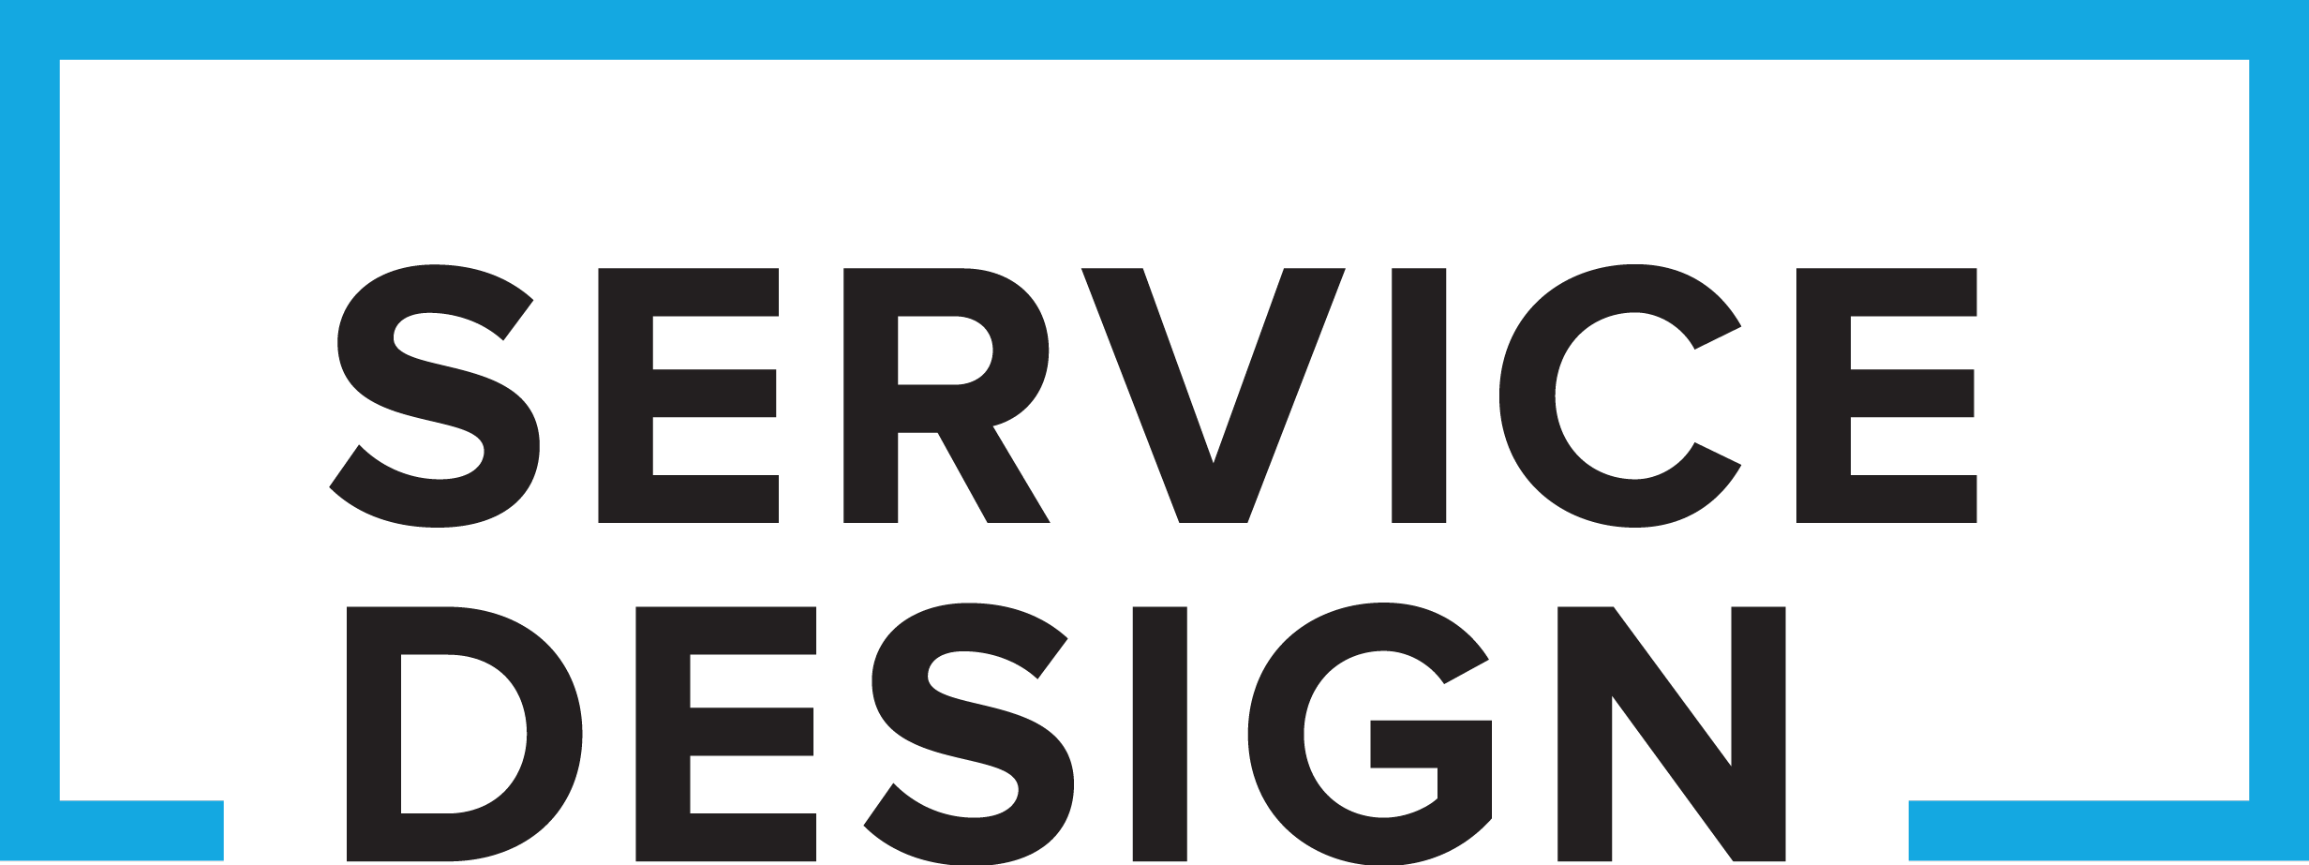 Service Design 2020